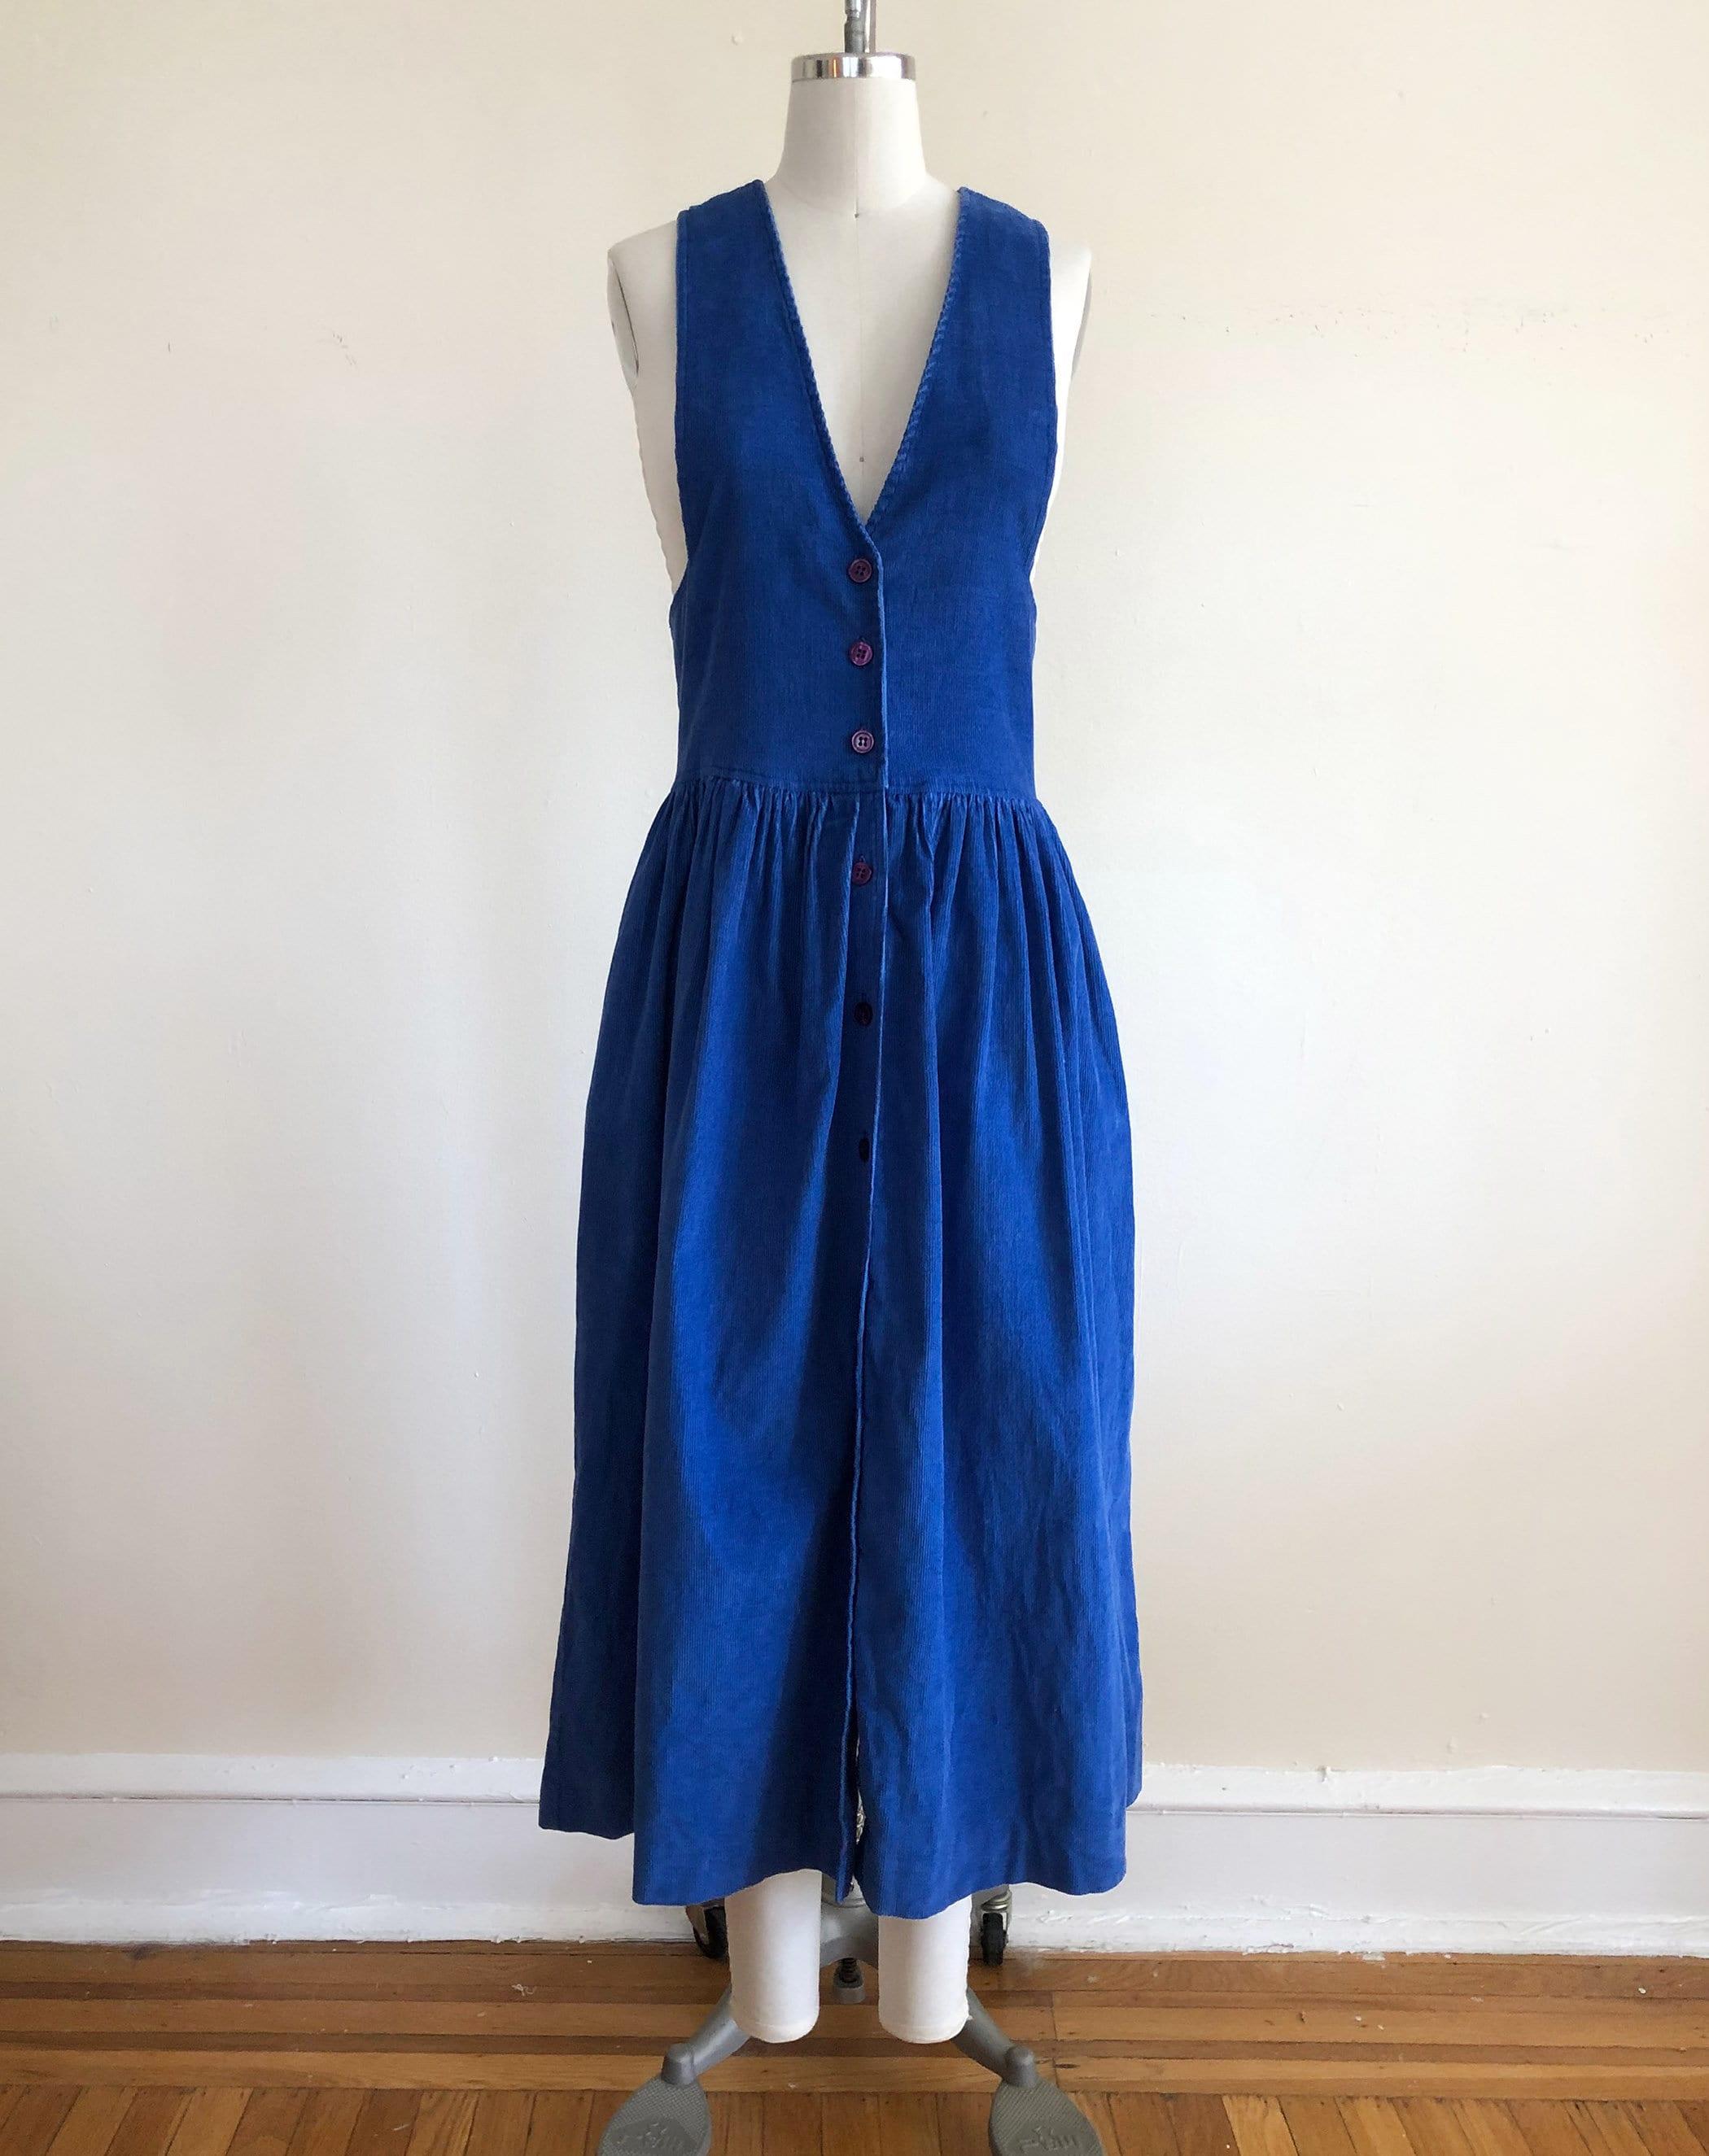 80s Dresses | Casual to Party Dresses Bright Blue Corduroy Pinafore Dress - 1980S $28.00 AT vintagedancer.com